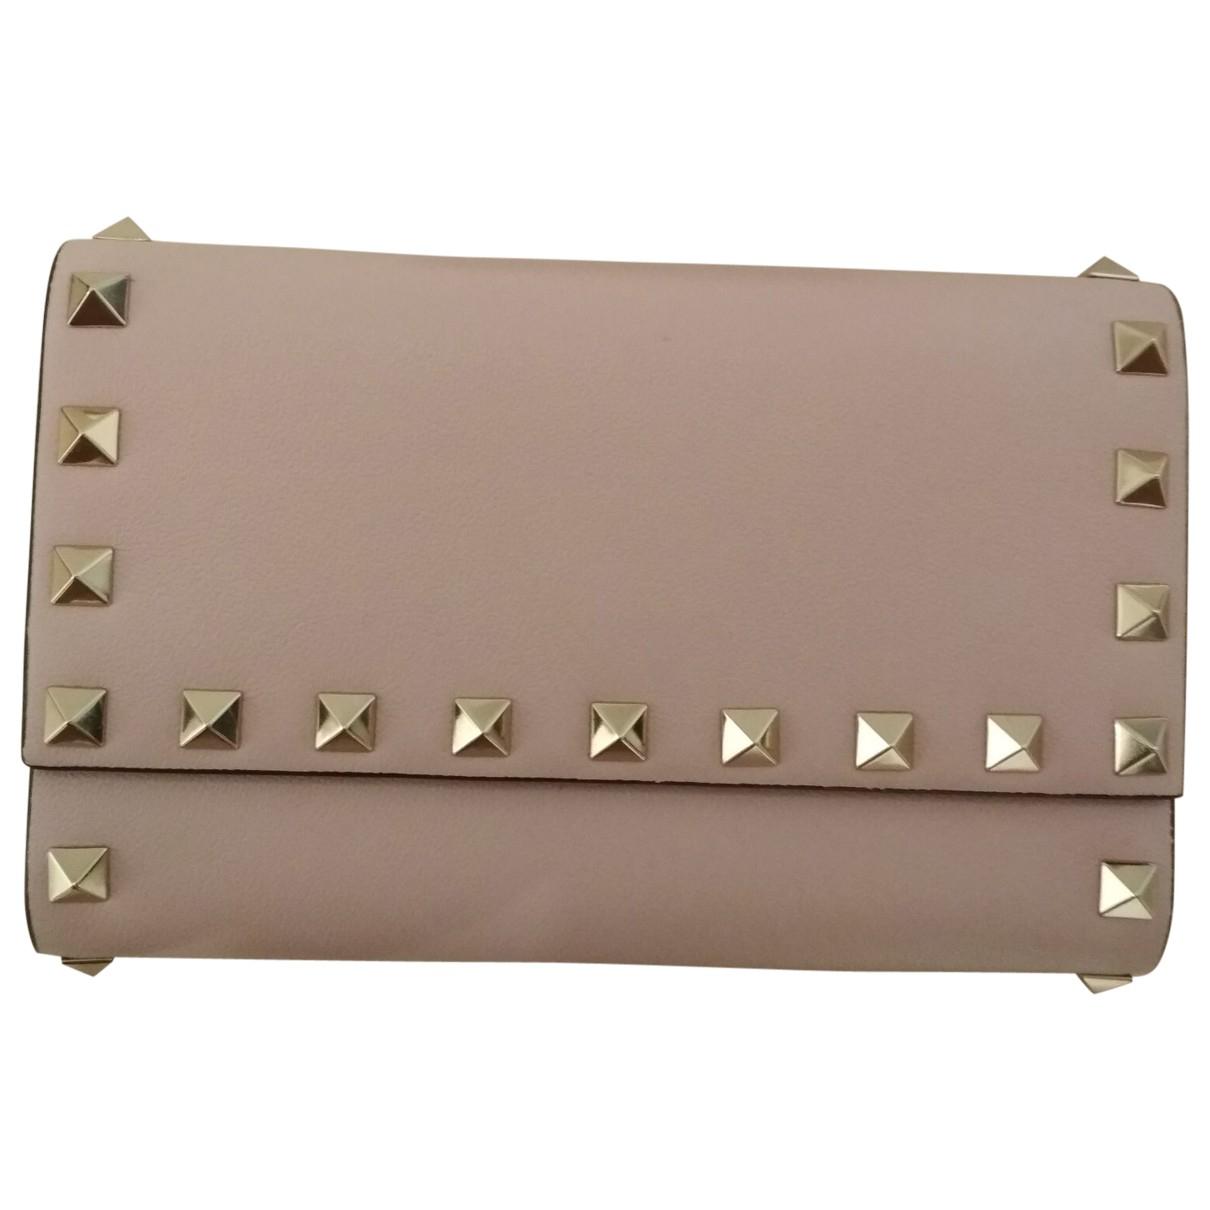 Valentino Garavani \N Pink Leather wallet for Women \N